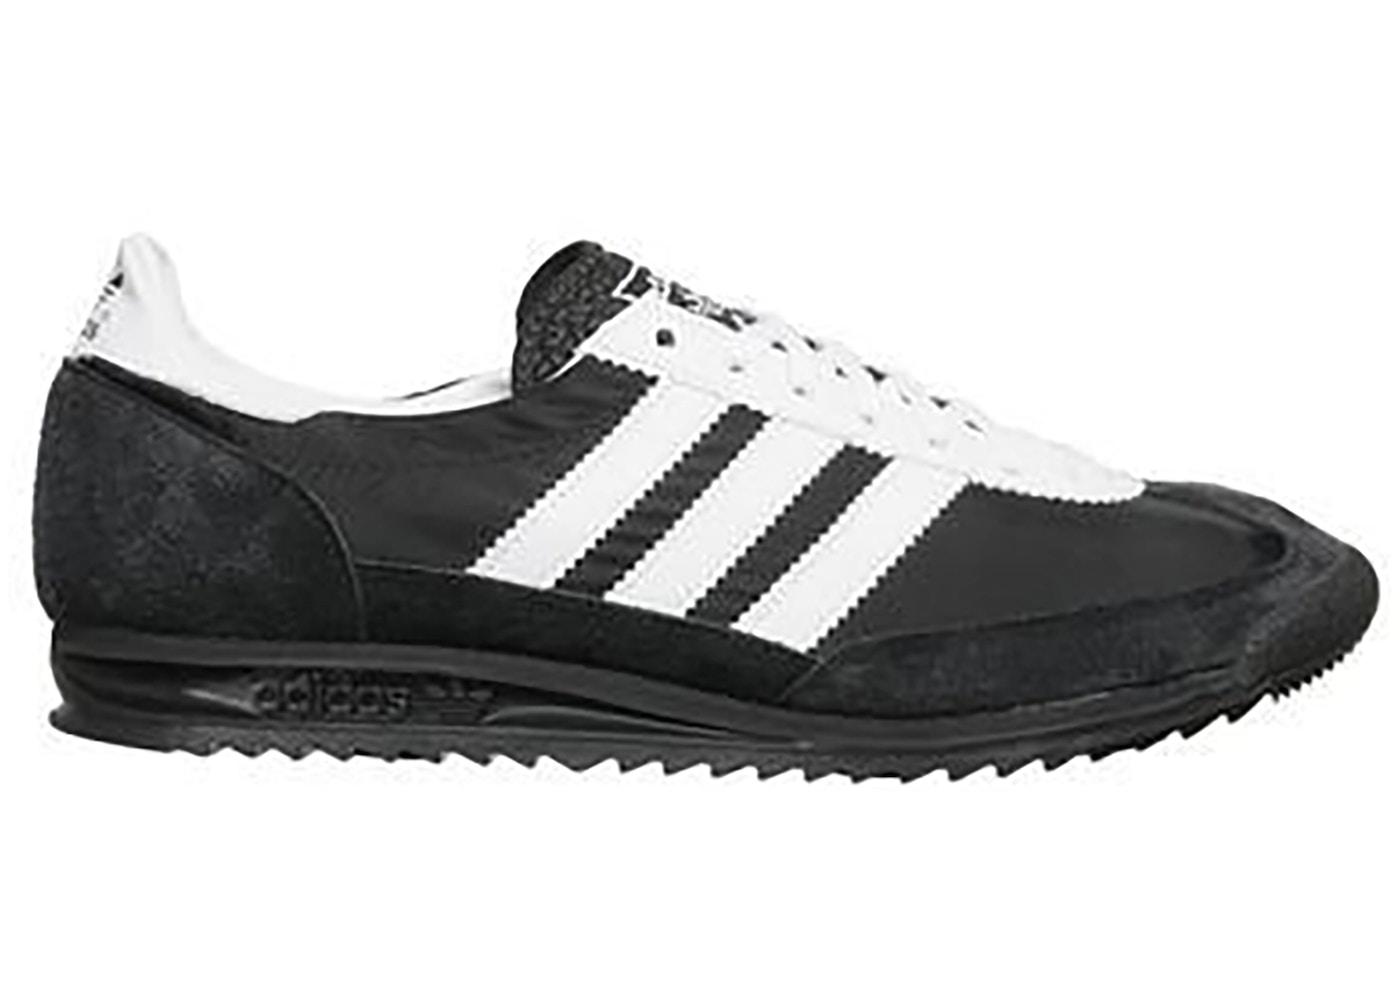 Feudal preferible término análogo  adidas SL 72 Black White - G13998